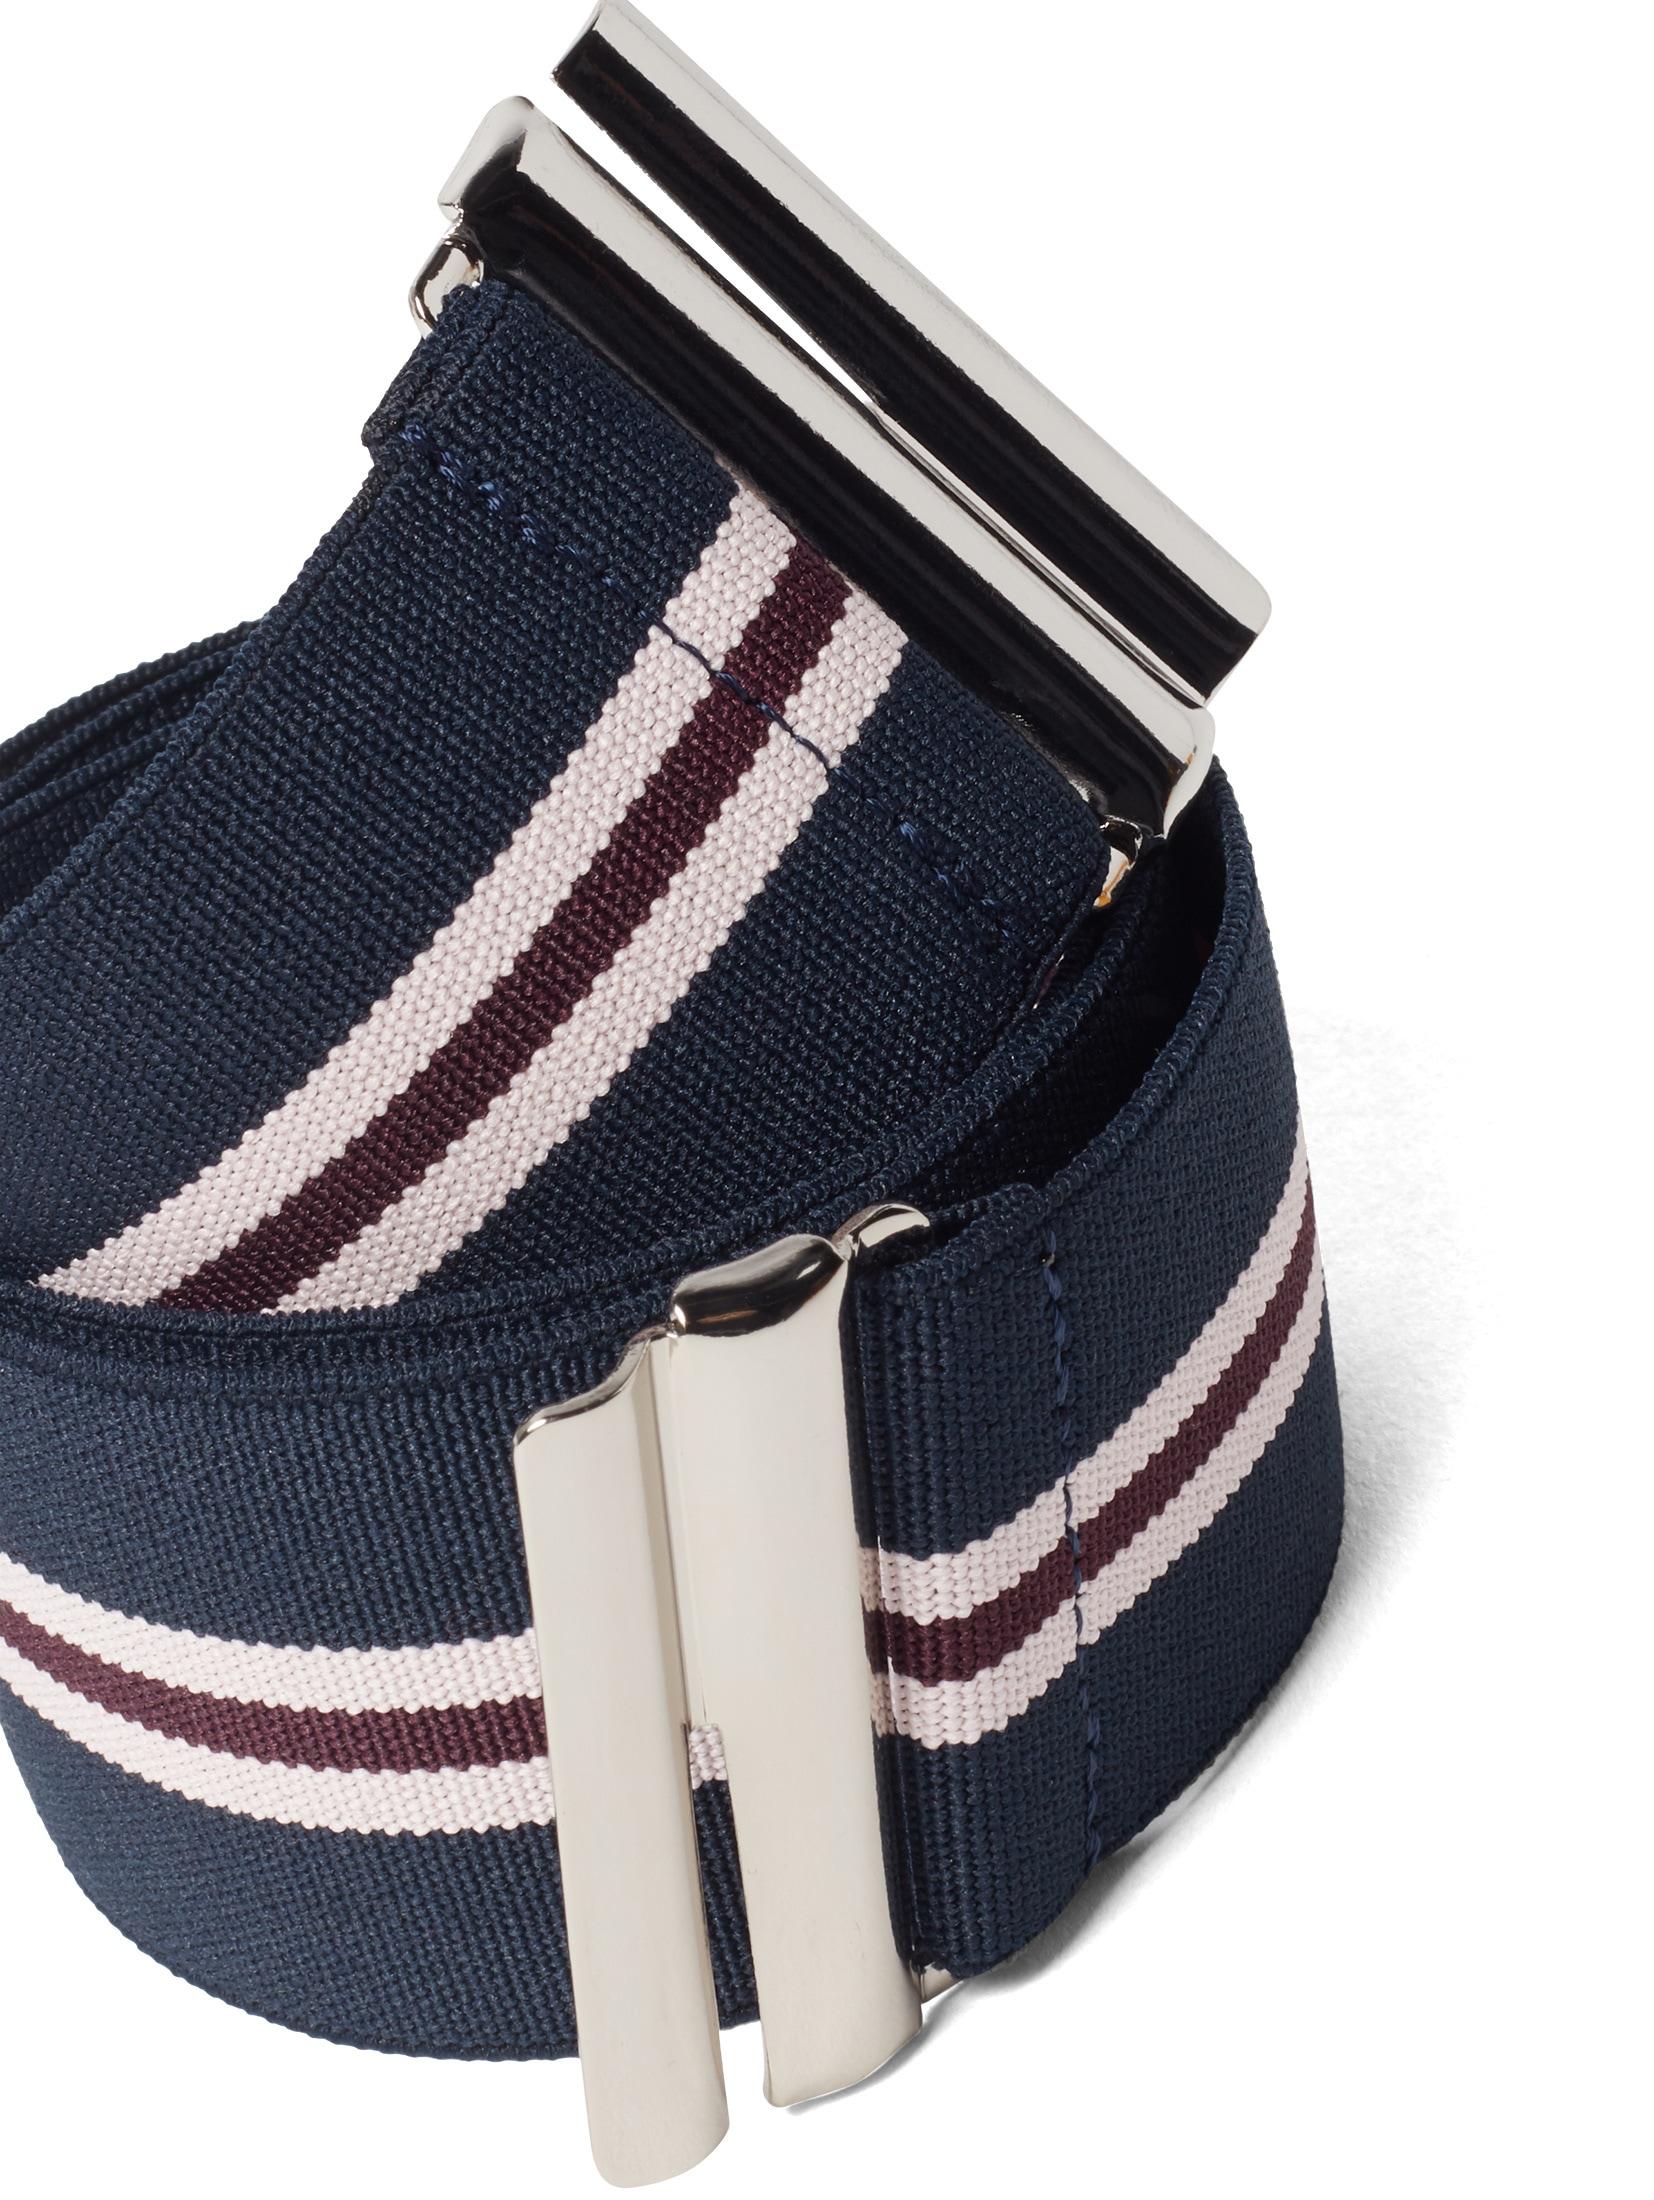 TOM TAILOR Denim Stoffgürtel Elastischer Taillengürtel   Accessoires > Gürtel > Stoffgürtel   Tom Tailor Denim